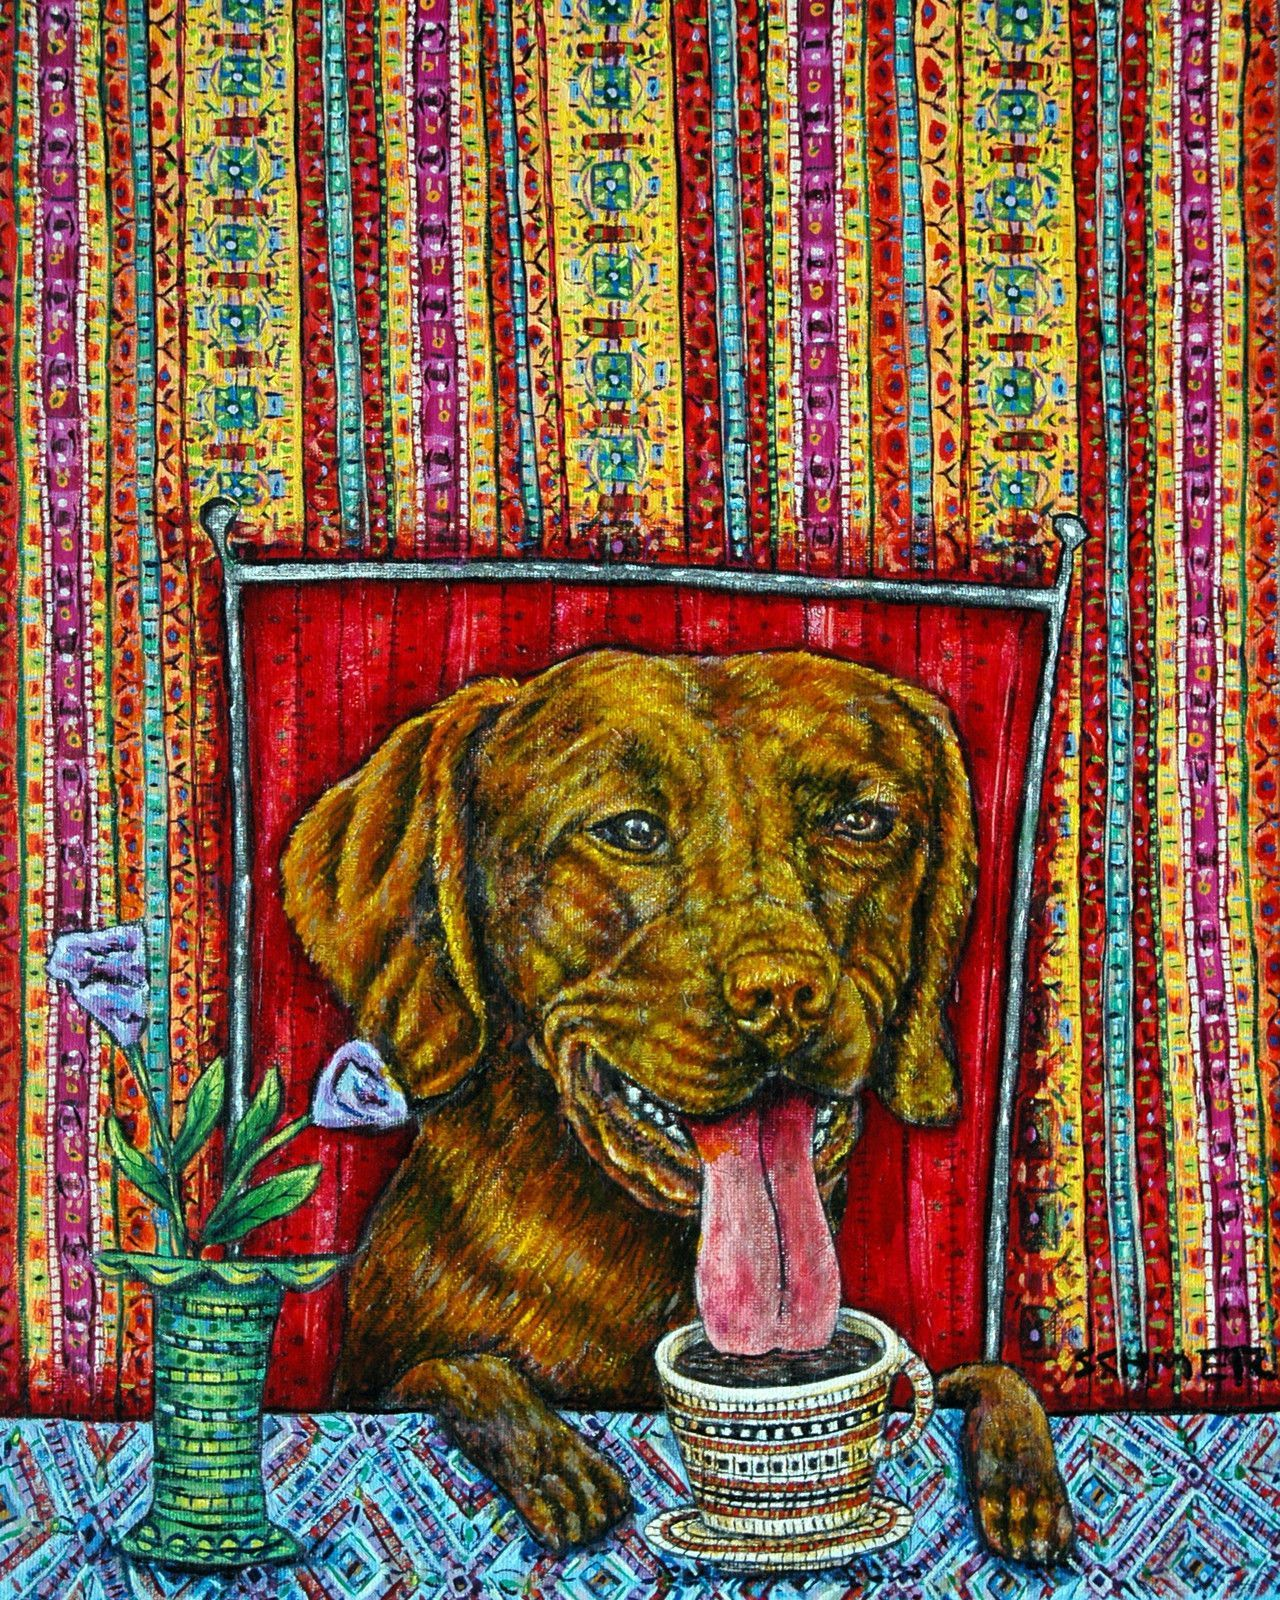 scottish terrier sleepy violinist violin animal  cafe art  picture 4x6  GLOSSY